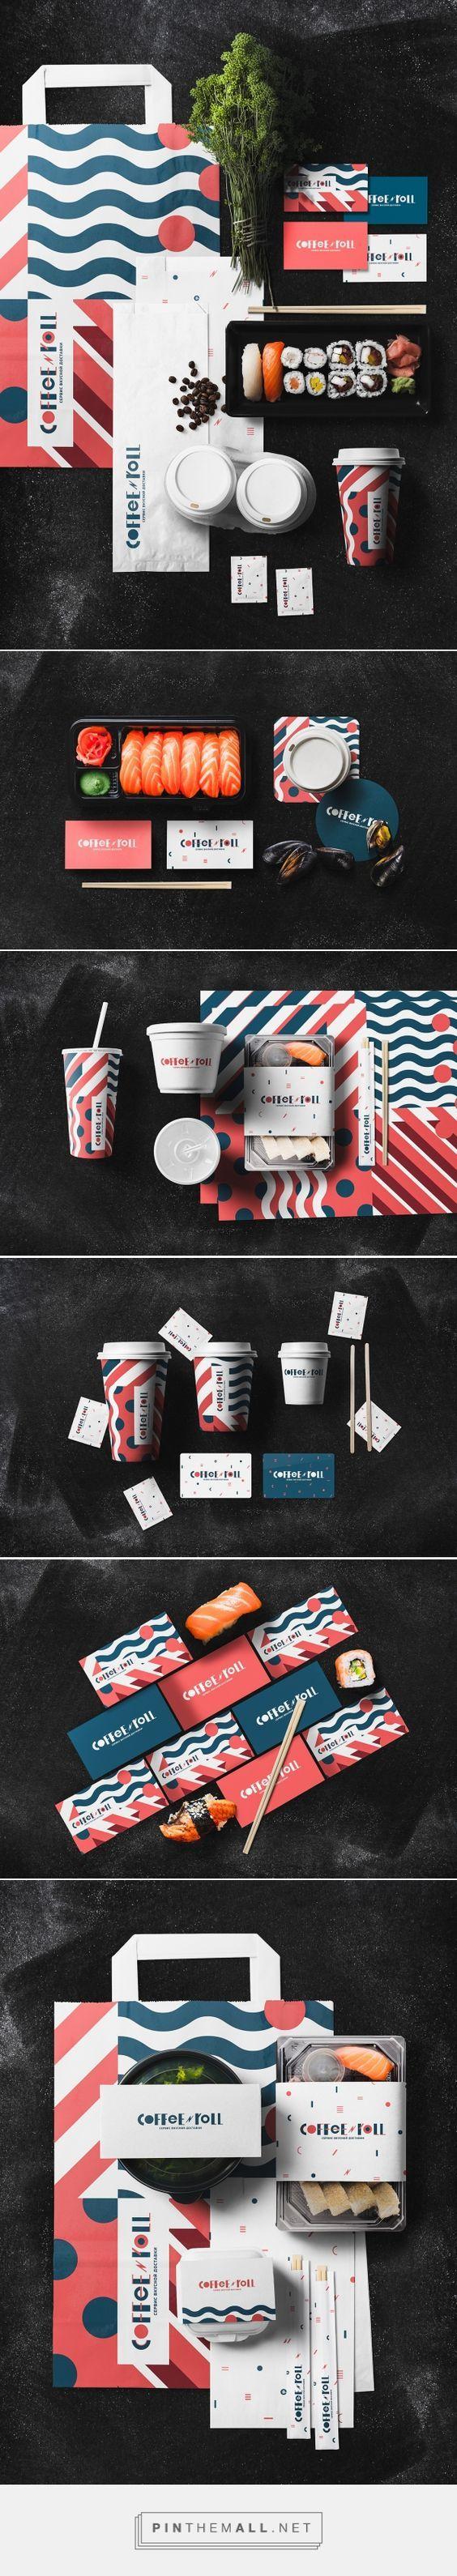 Coffee N Roll Branding by Dmitry Neal on Behance | Fivestar Branding – Design…